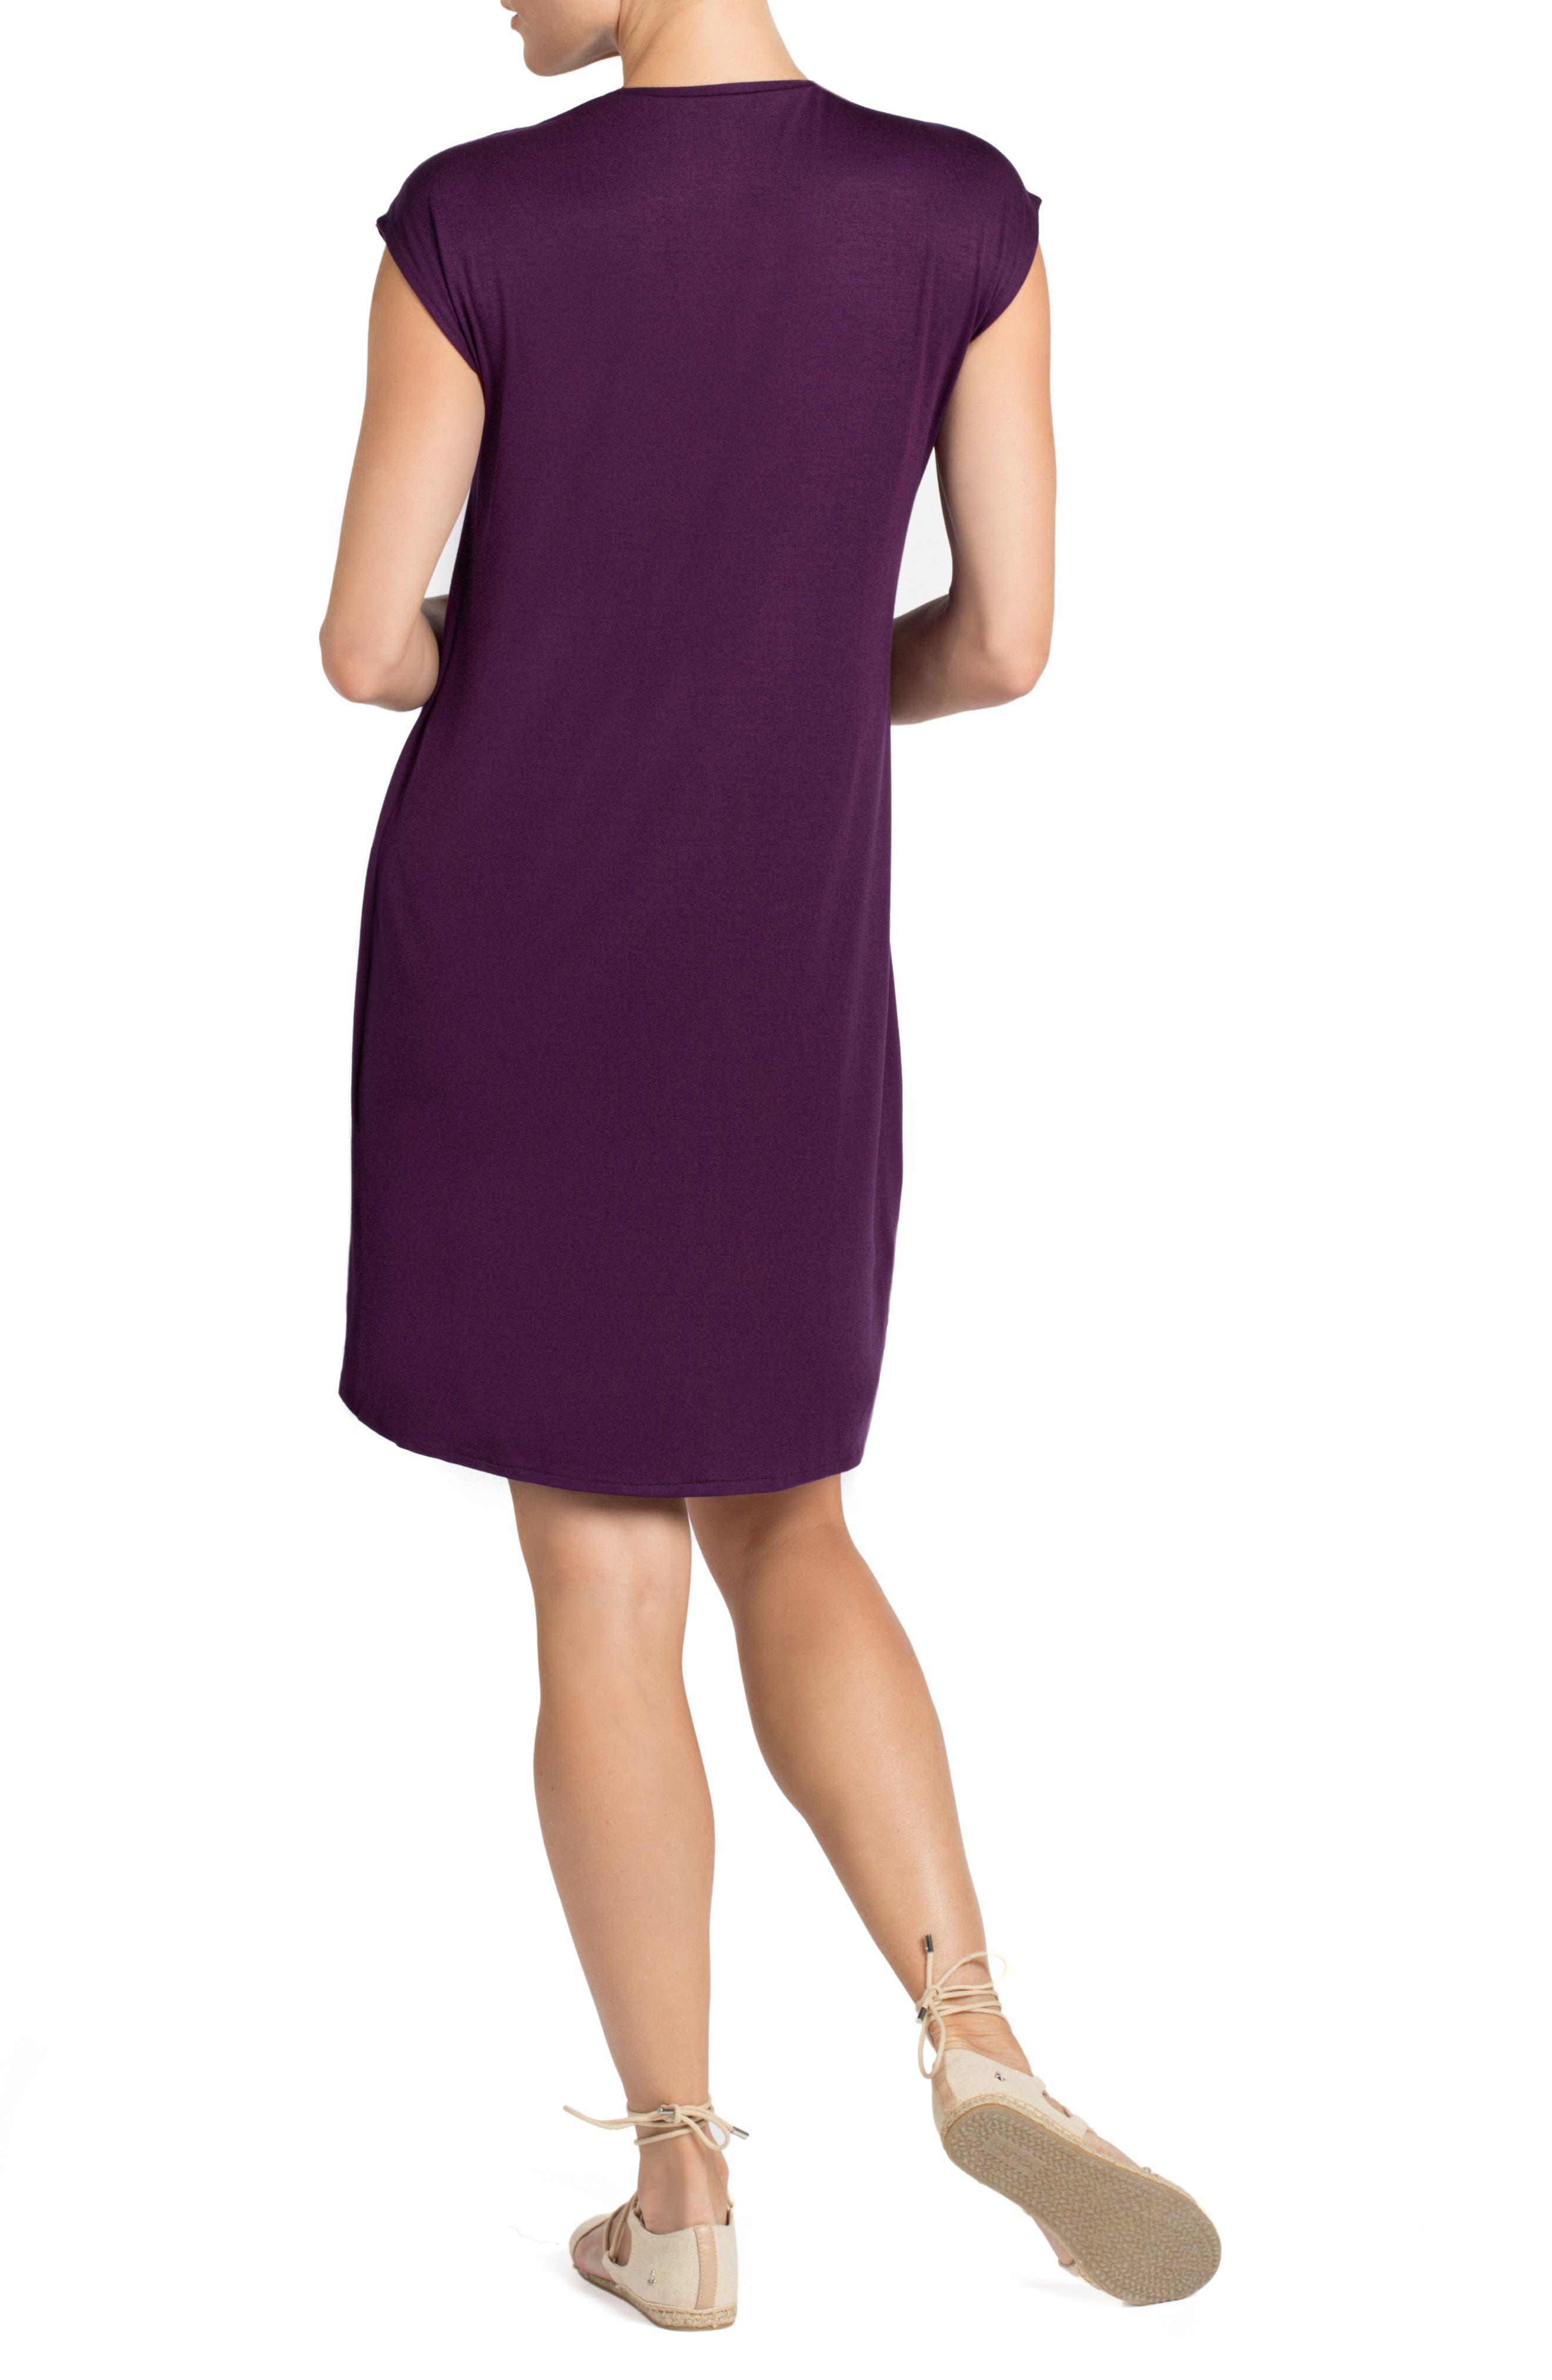 Lille Layered Maternity/Nursing Sheath Dress,                             Alternate thumbnail 2, color,                             EGGPLANT/ DARK MINT CONTRAST